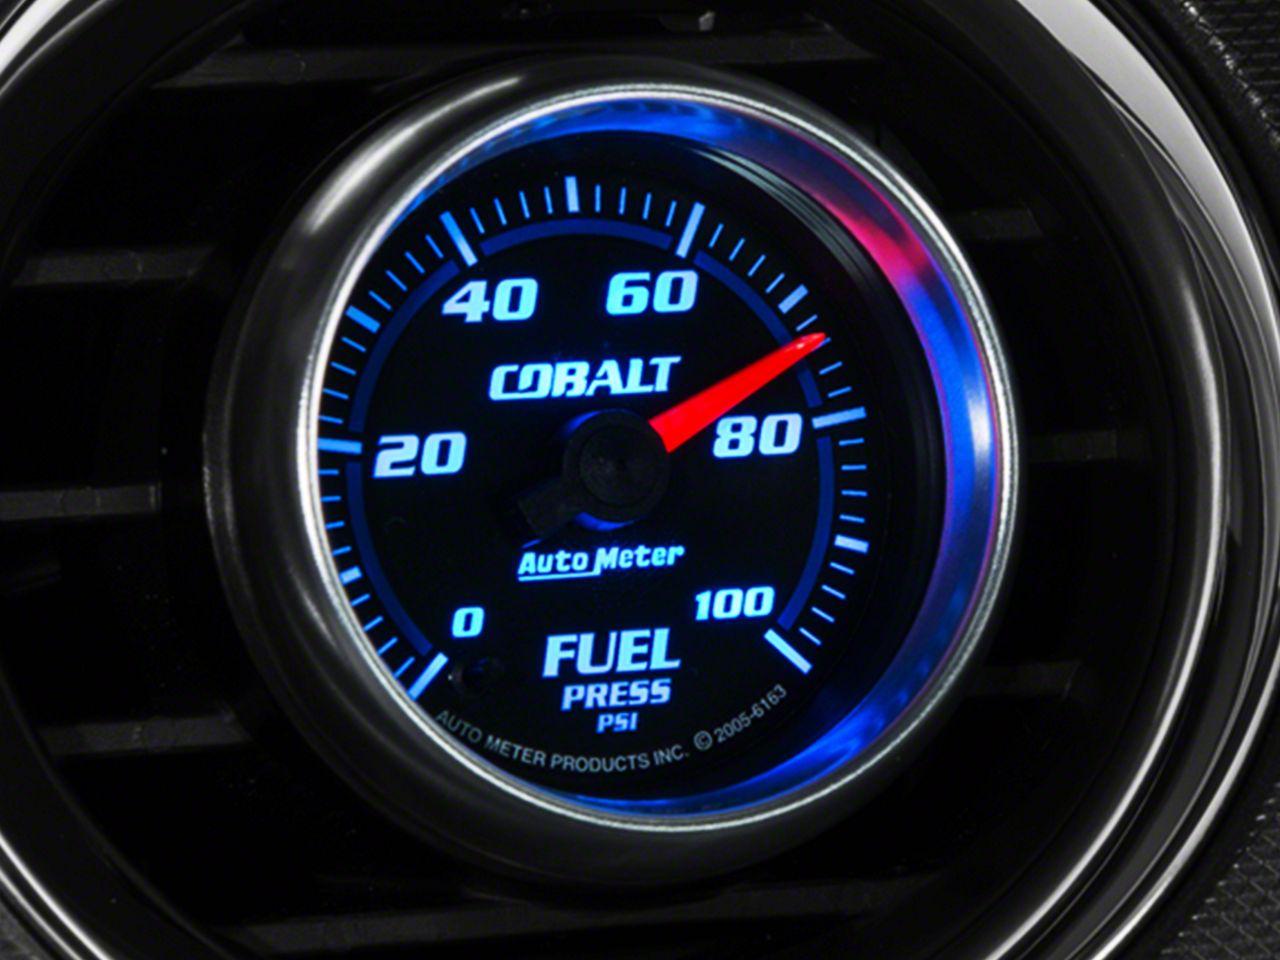 Auto Meter Cobalt Fuel Pressure Gauge - Electrical (08-18 All)